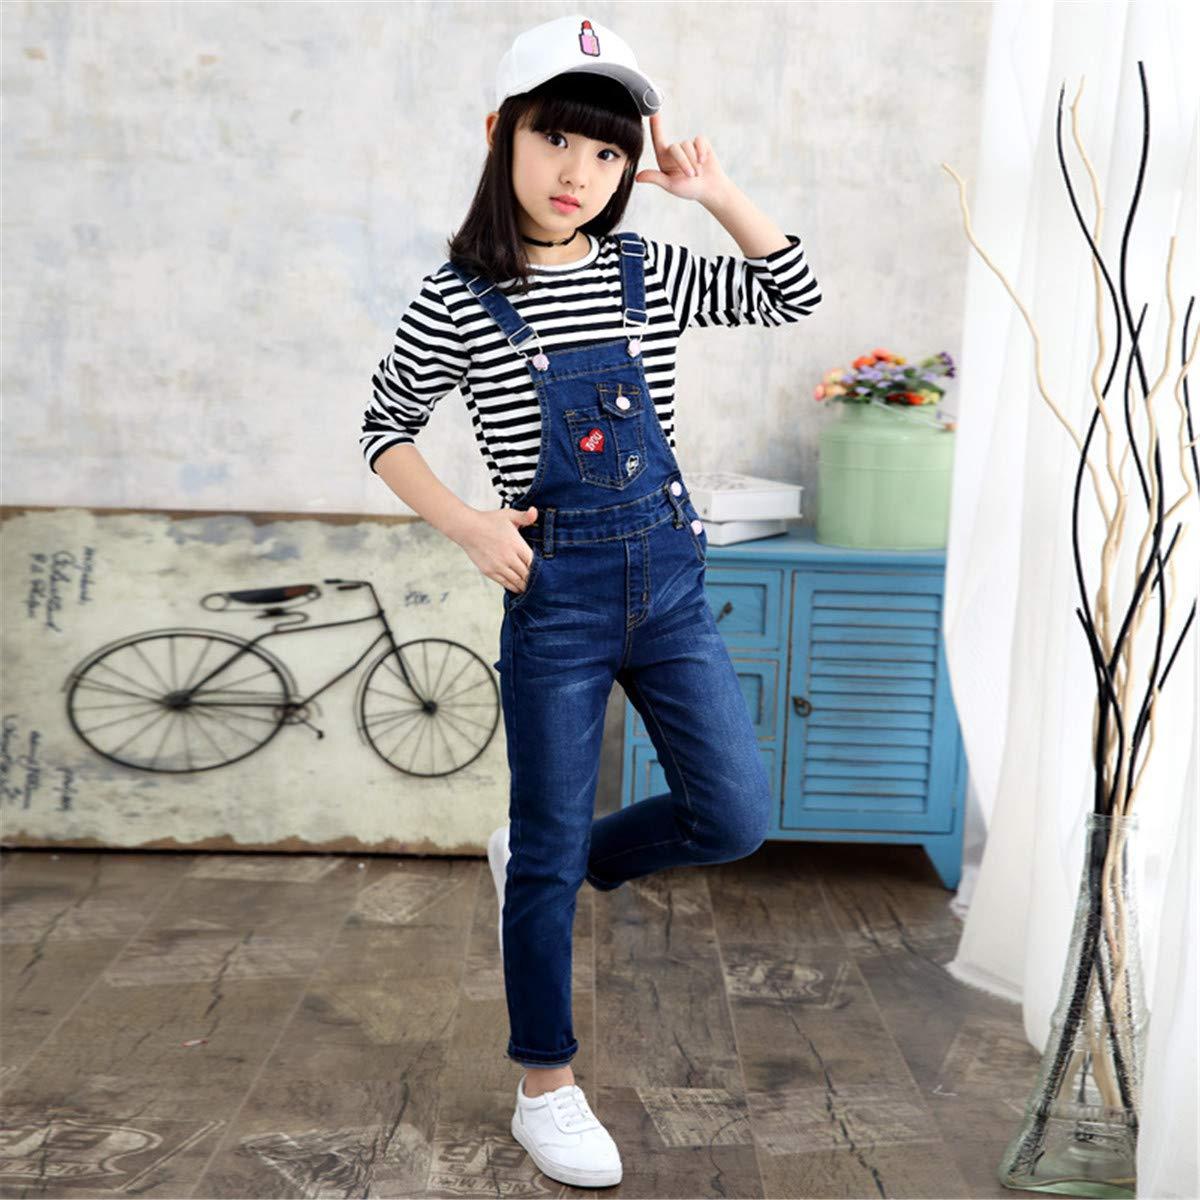 Big Girls Kids One Piece Classic Distressed Denim Suspender Bib Overalls Jeans Strecthy Ripped Jeans Romper Jumpsuit